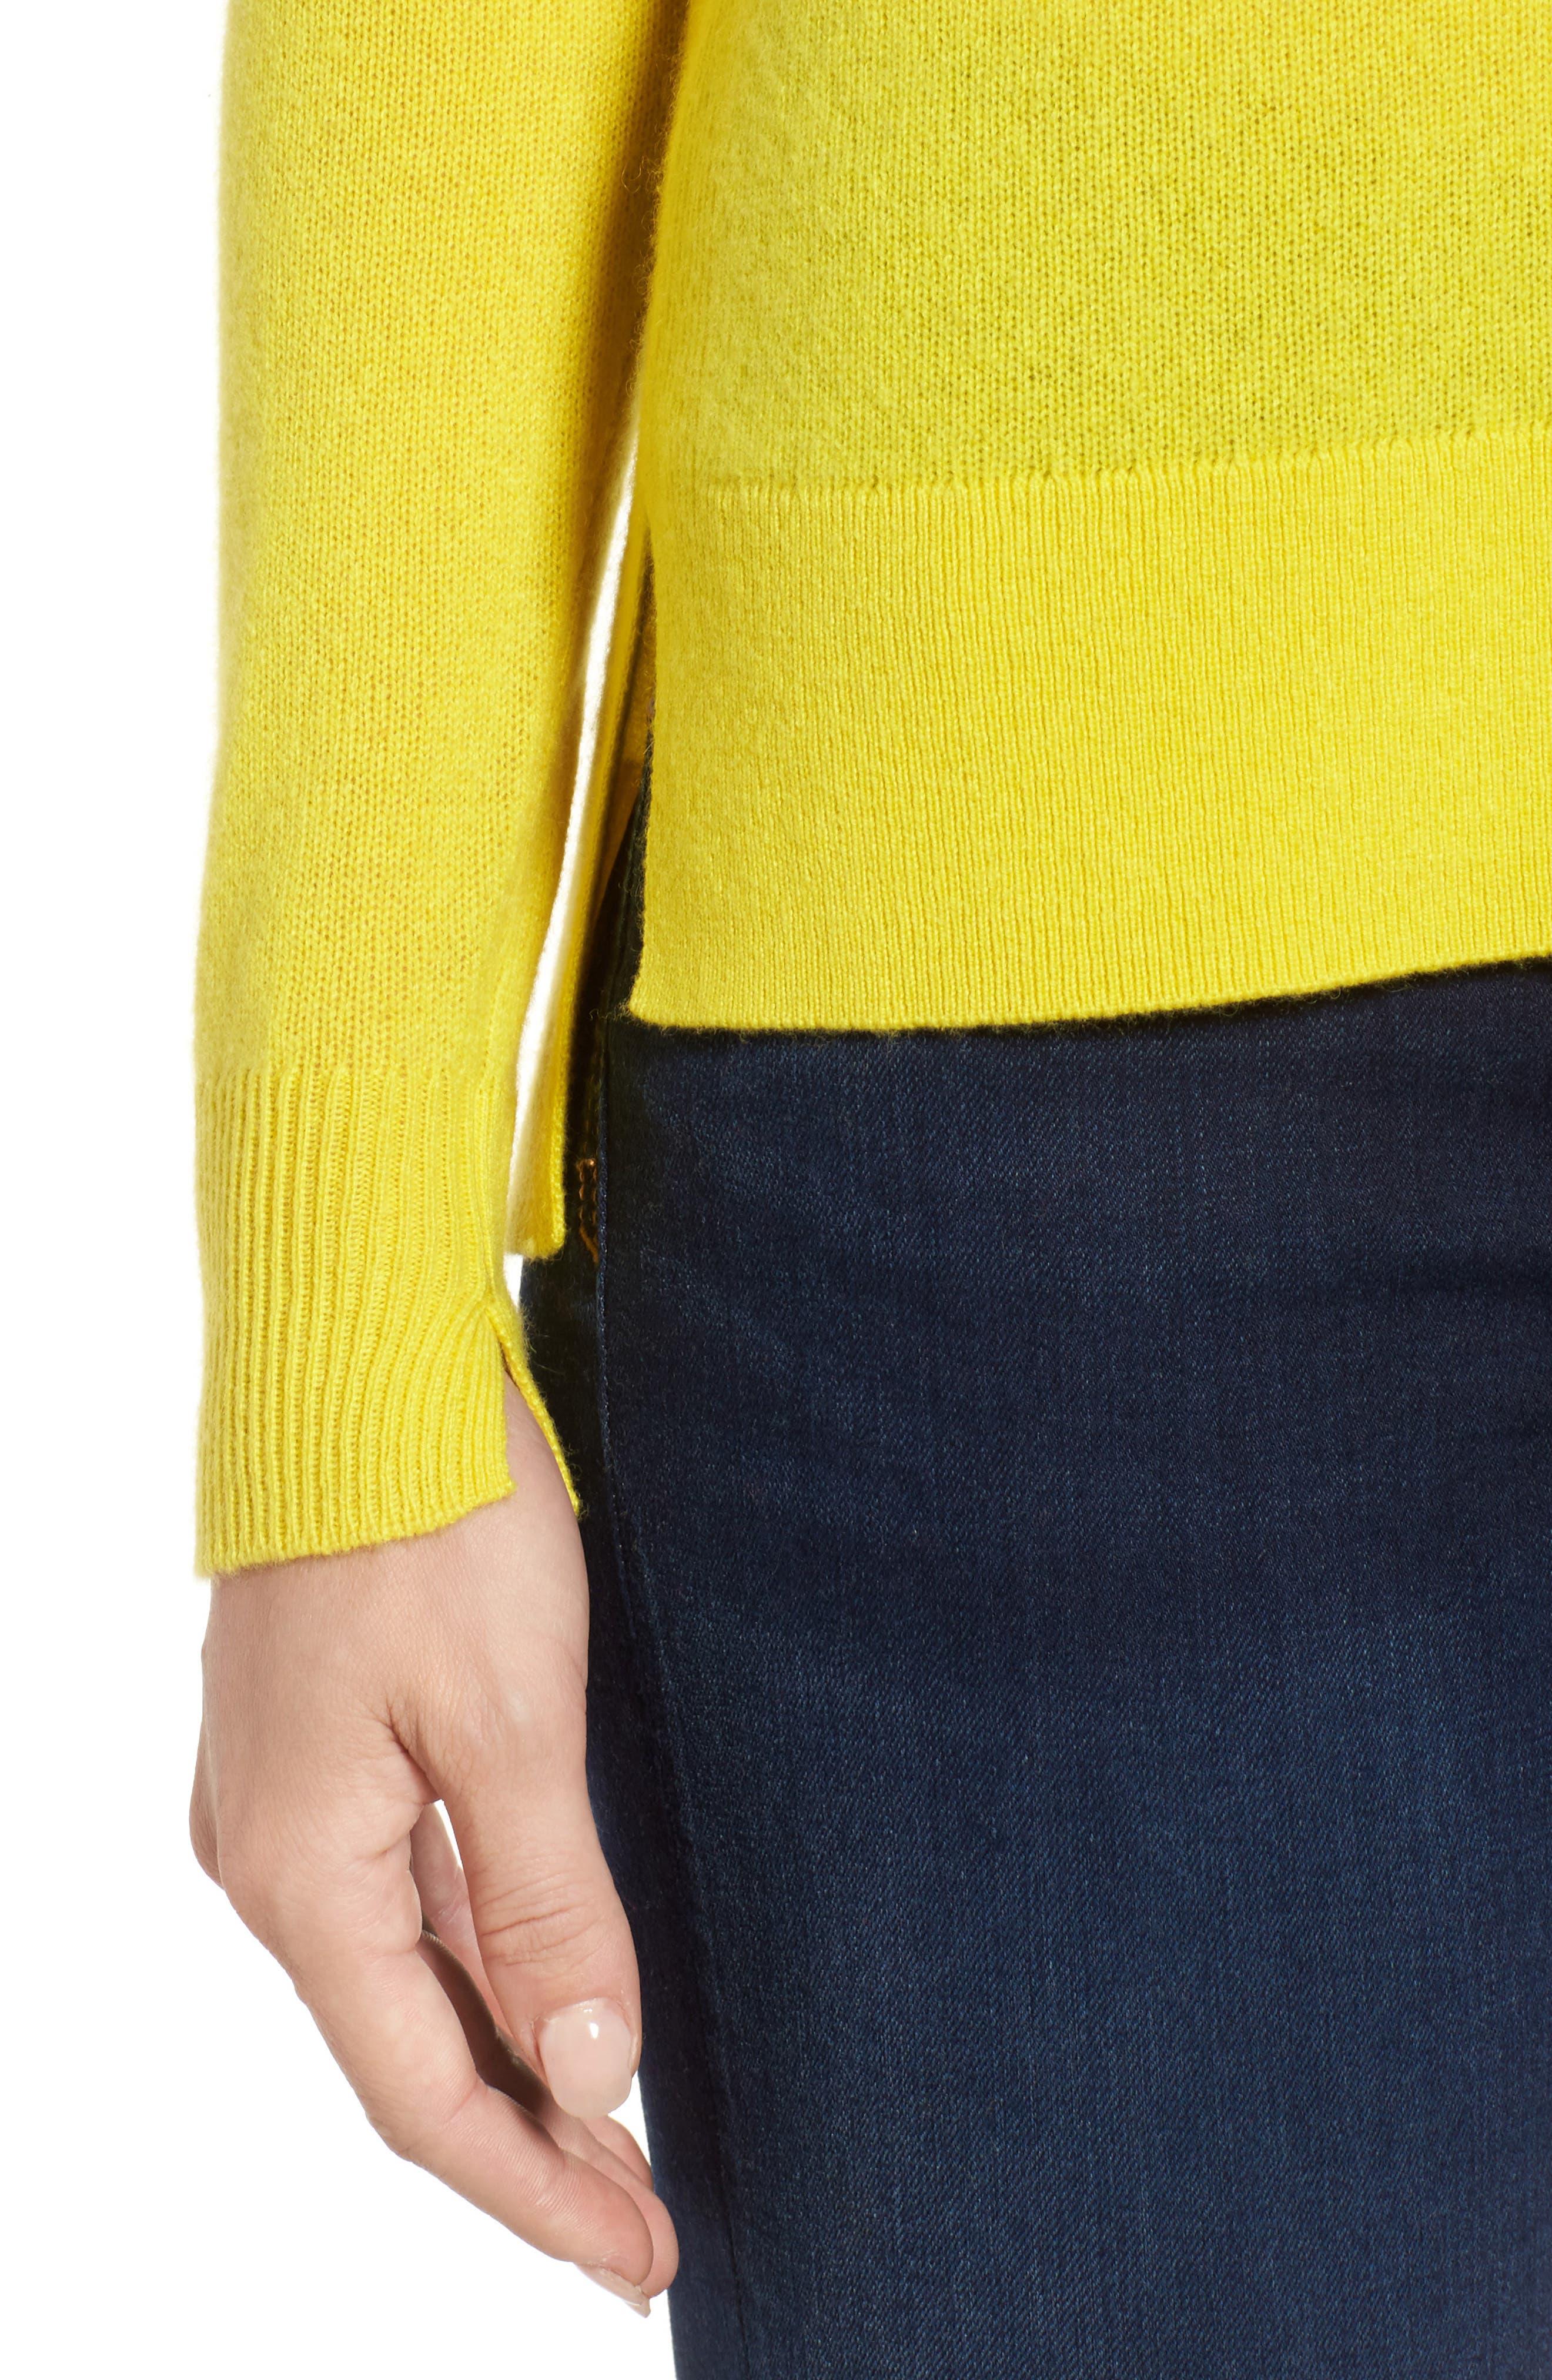 Crewneck Cashmere Sweater,                             Alternate thumbnail 5, color,                             Blazing Buttercup